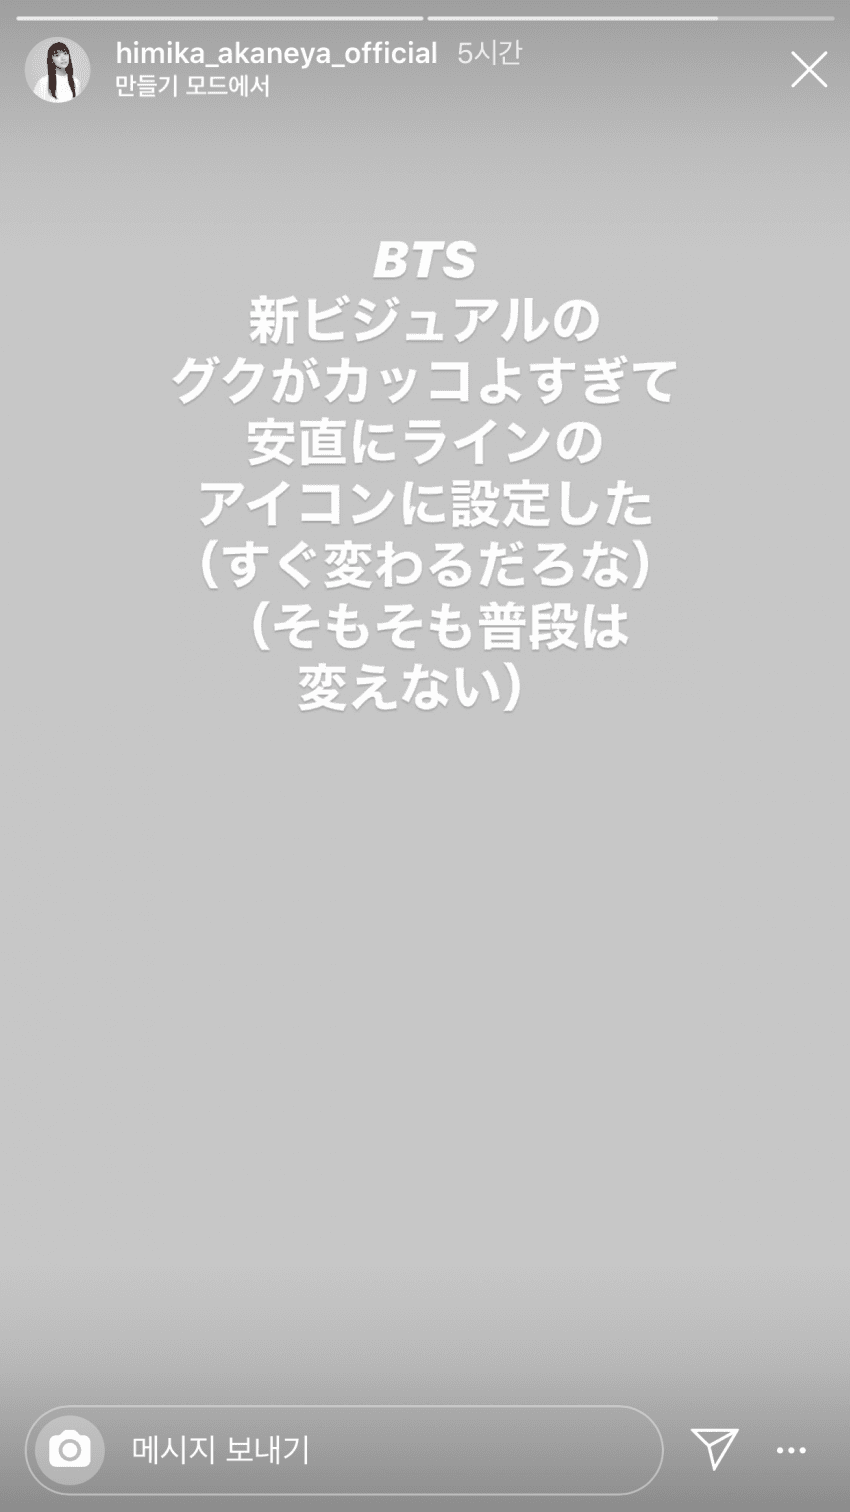 viewimage.php?no=24b0d769e1d32ca73ced8ffa11d02831dfaf0852456fb21930271cc4cf87ae3552f8047bc064b419dfeb95ed79f5810a96c6d266a24e1a613bfa56871662f5f86a243ad933eb7e7f9d219fc977feb1999b8fc8124d2c179814c38dddd12201a564581749949f2414b93345842c